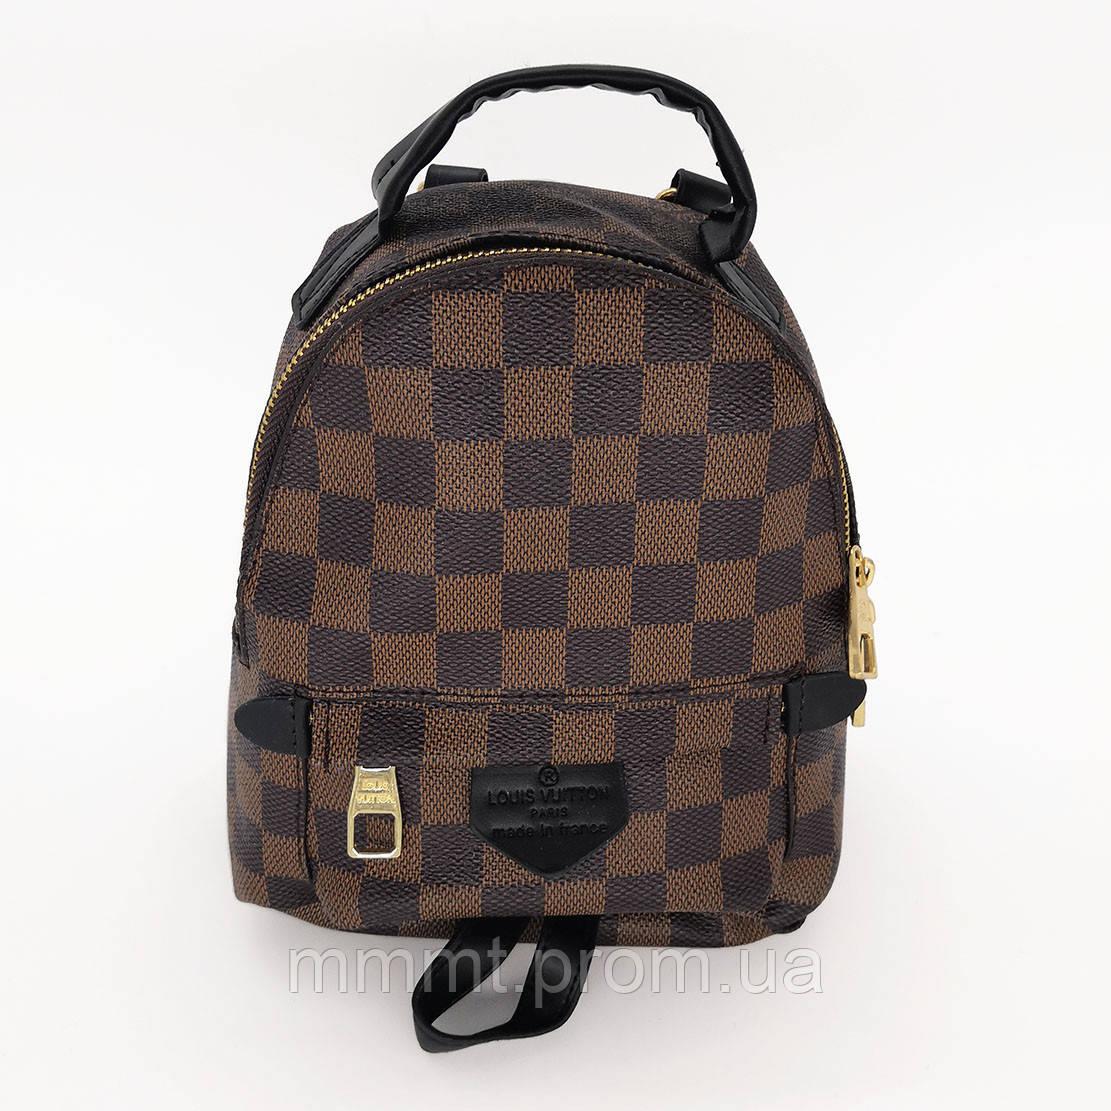 Рюкзак мини Louis Vuitton квадратики копия, цена 950 грн., купить в ... 217669c44b9